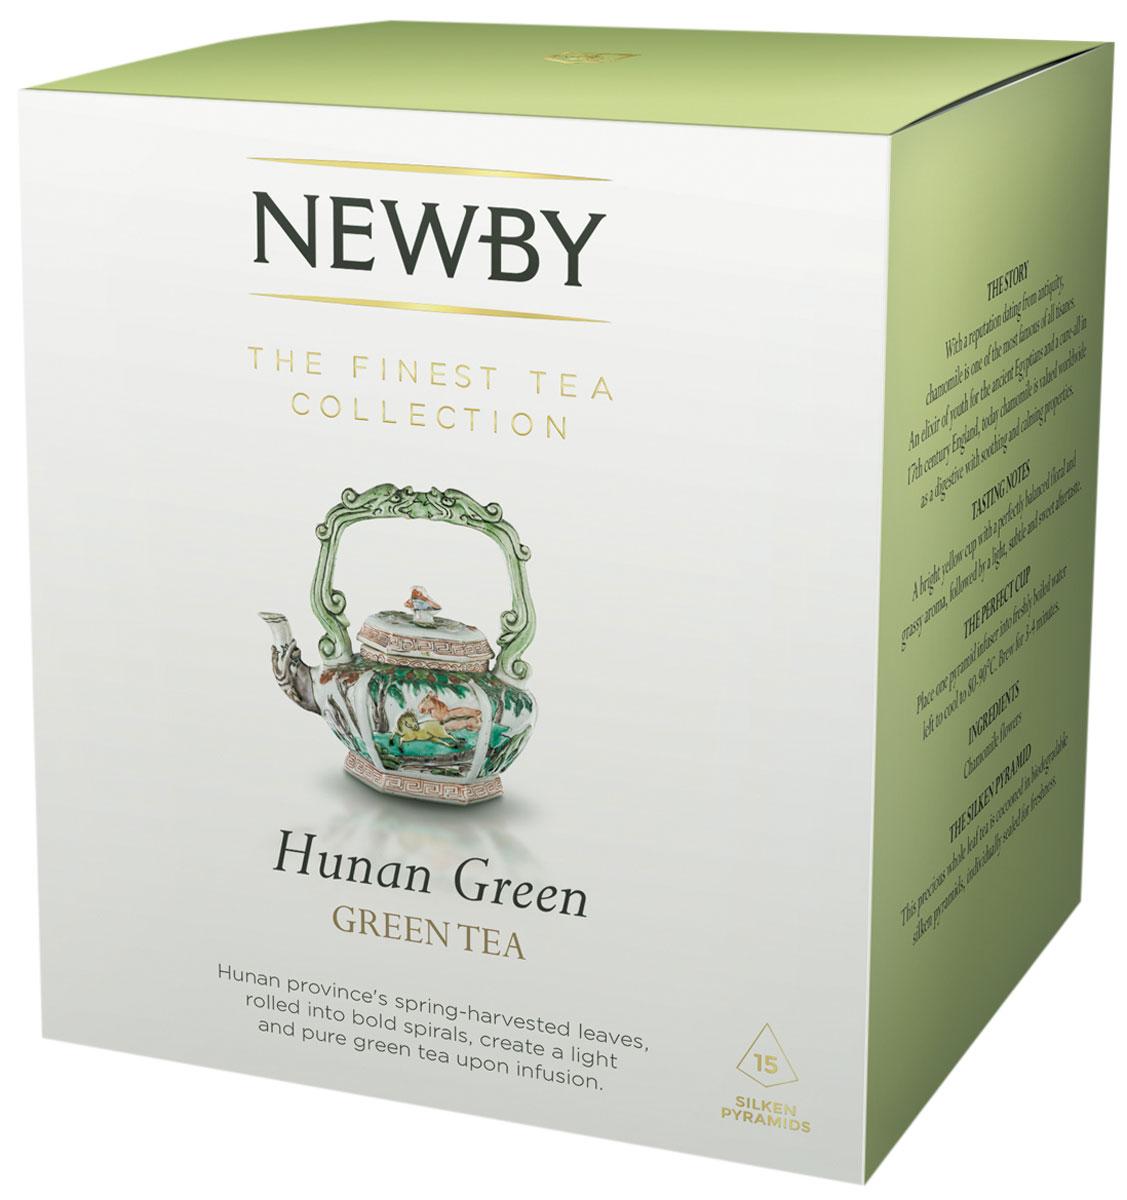 Newby Hunan Green зеленый чай в пирамидках, 15 шт newby peppermint травяной чай в пирамидках 15 шт